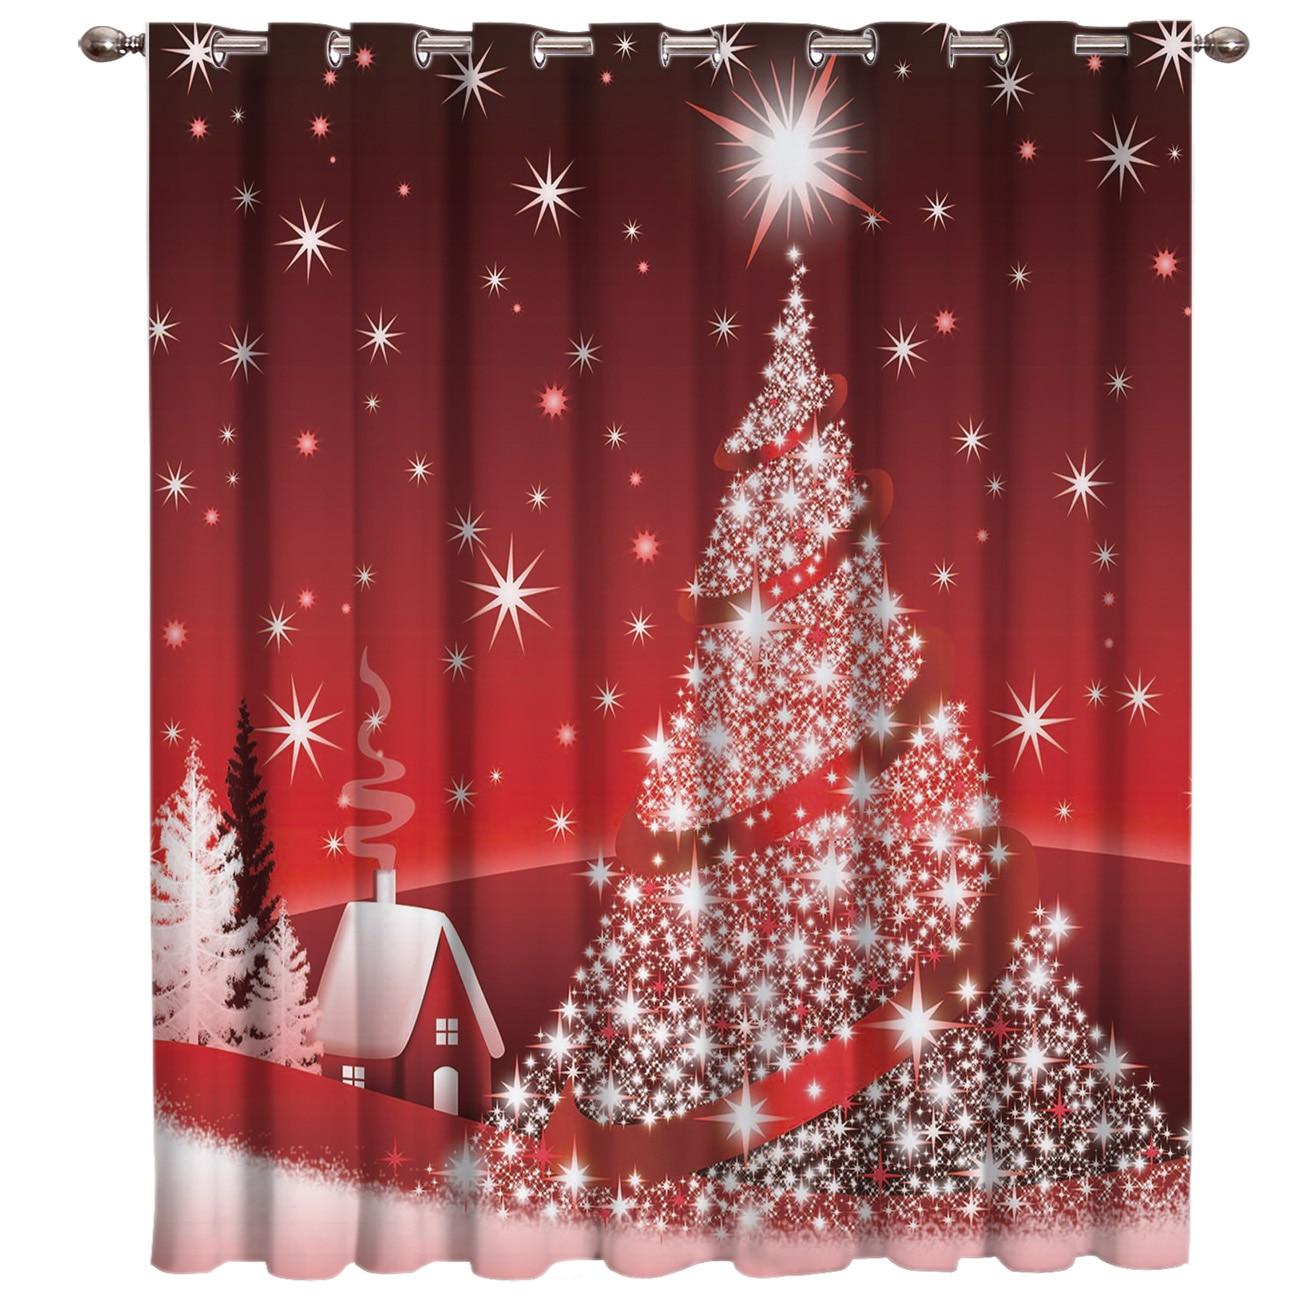 Merry Christmas Tree Window Treatments Curtains Valance Bathroom Outdoor Indoor Kids Window Treatment Valances Window Treatment